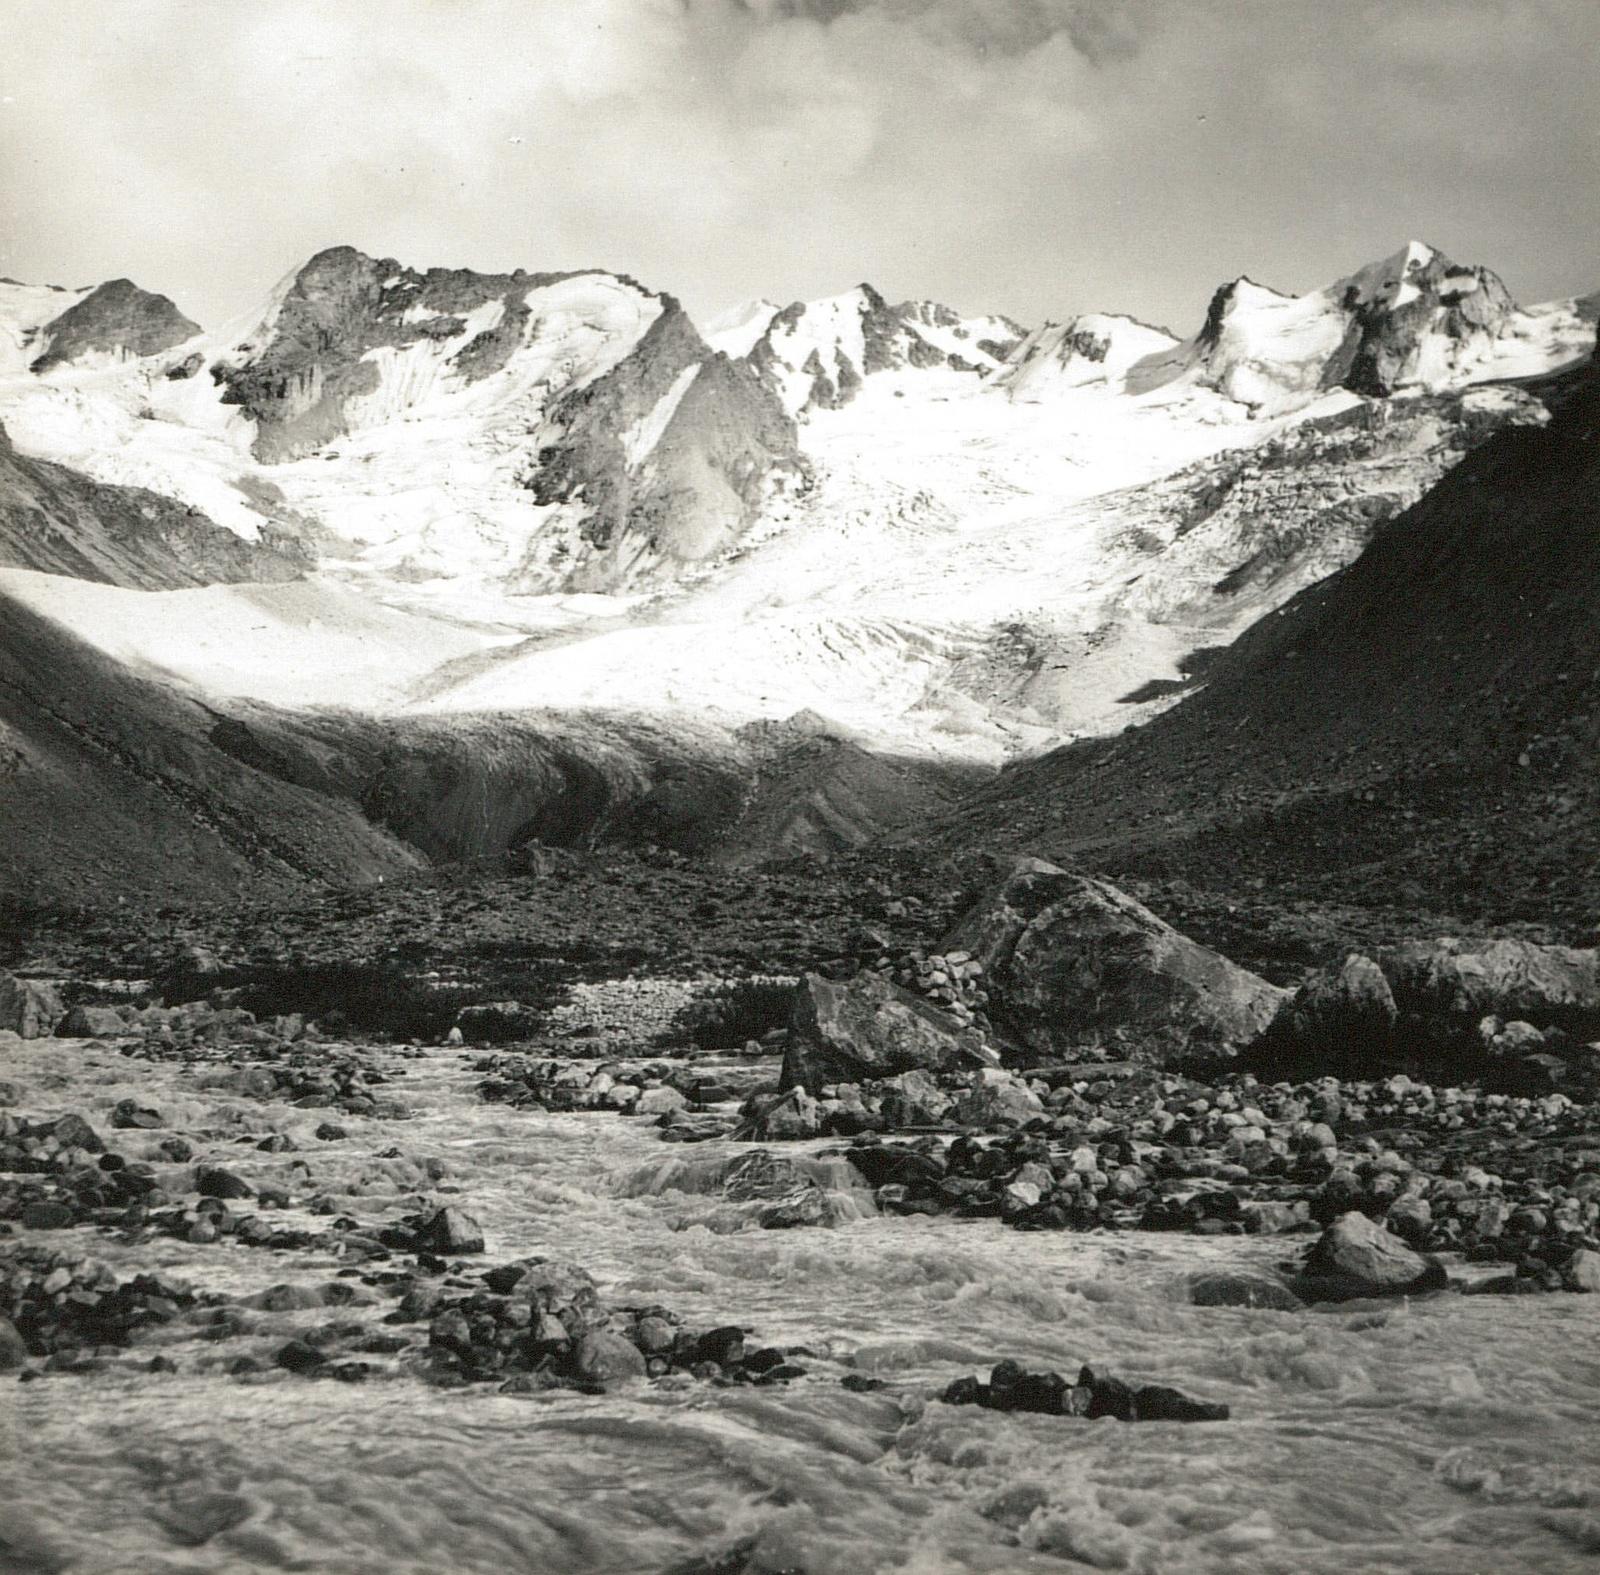 Центральный Кавказ. Долина Адылсу